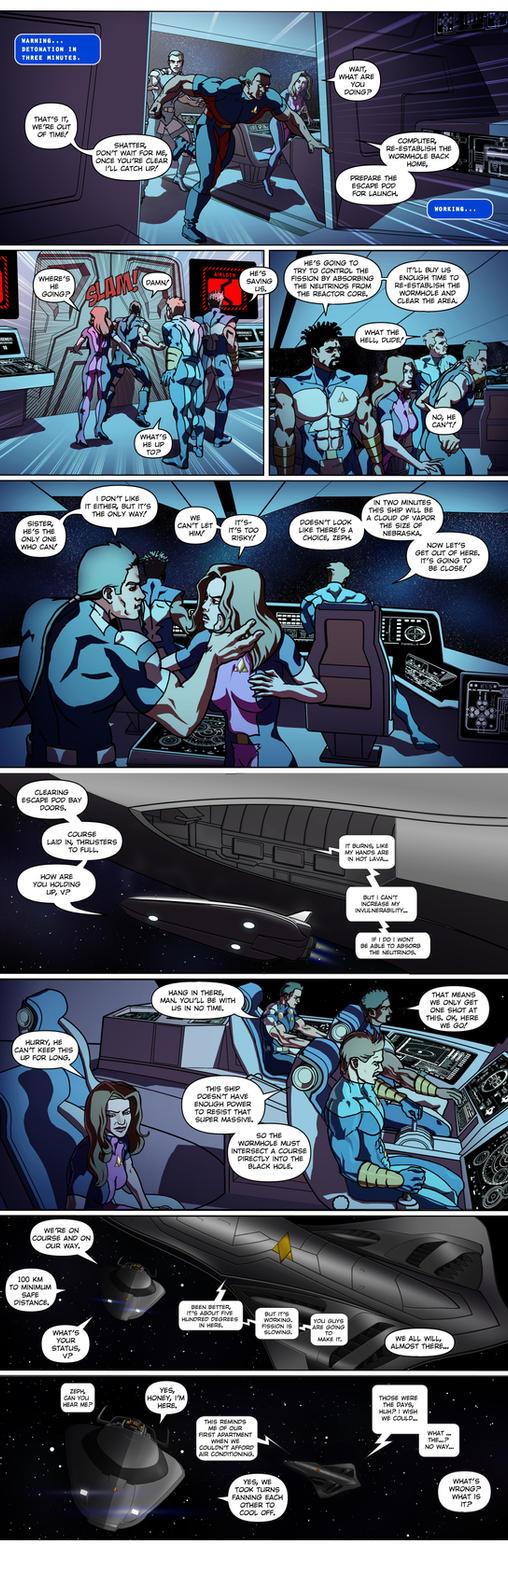 MOCC 2 Final Chapter p25-26 by RODCOM1000